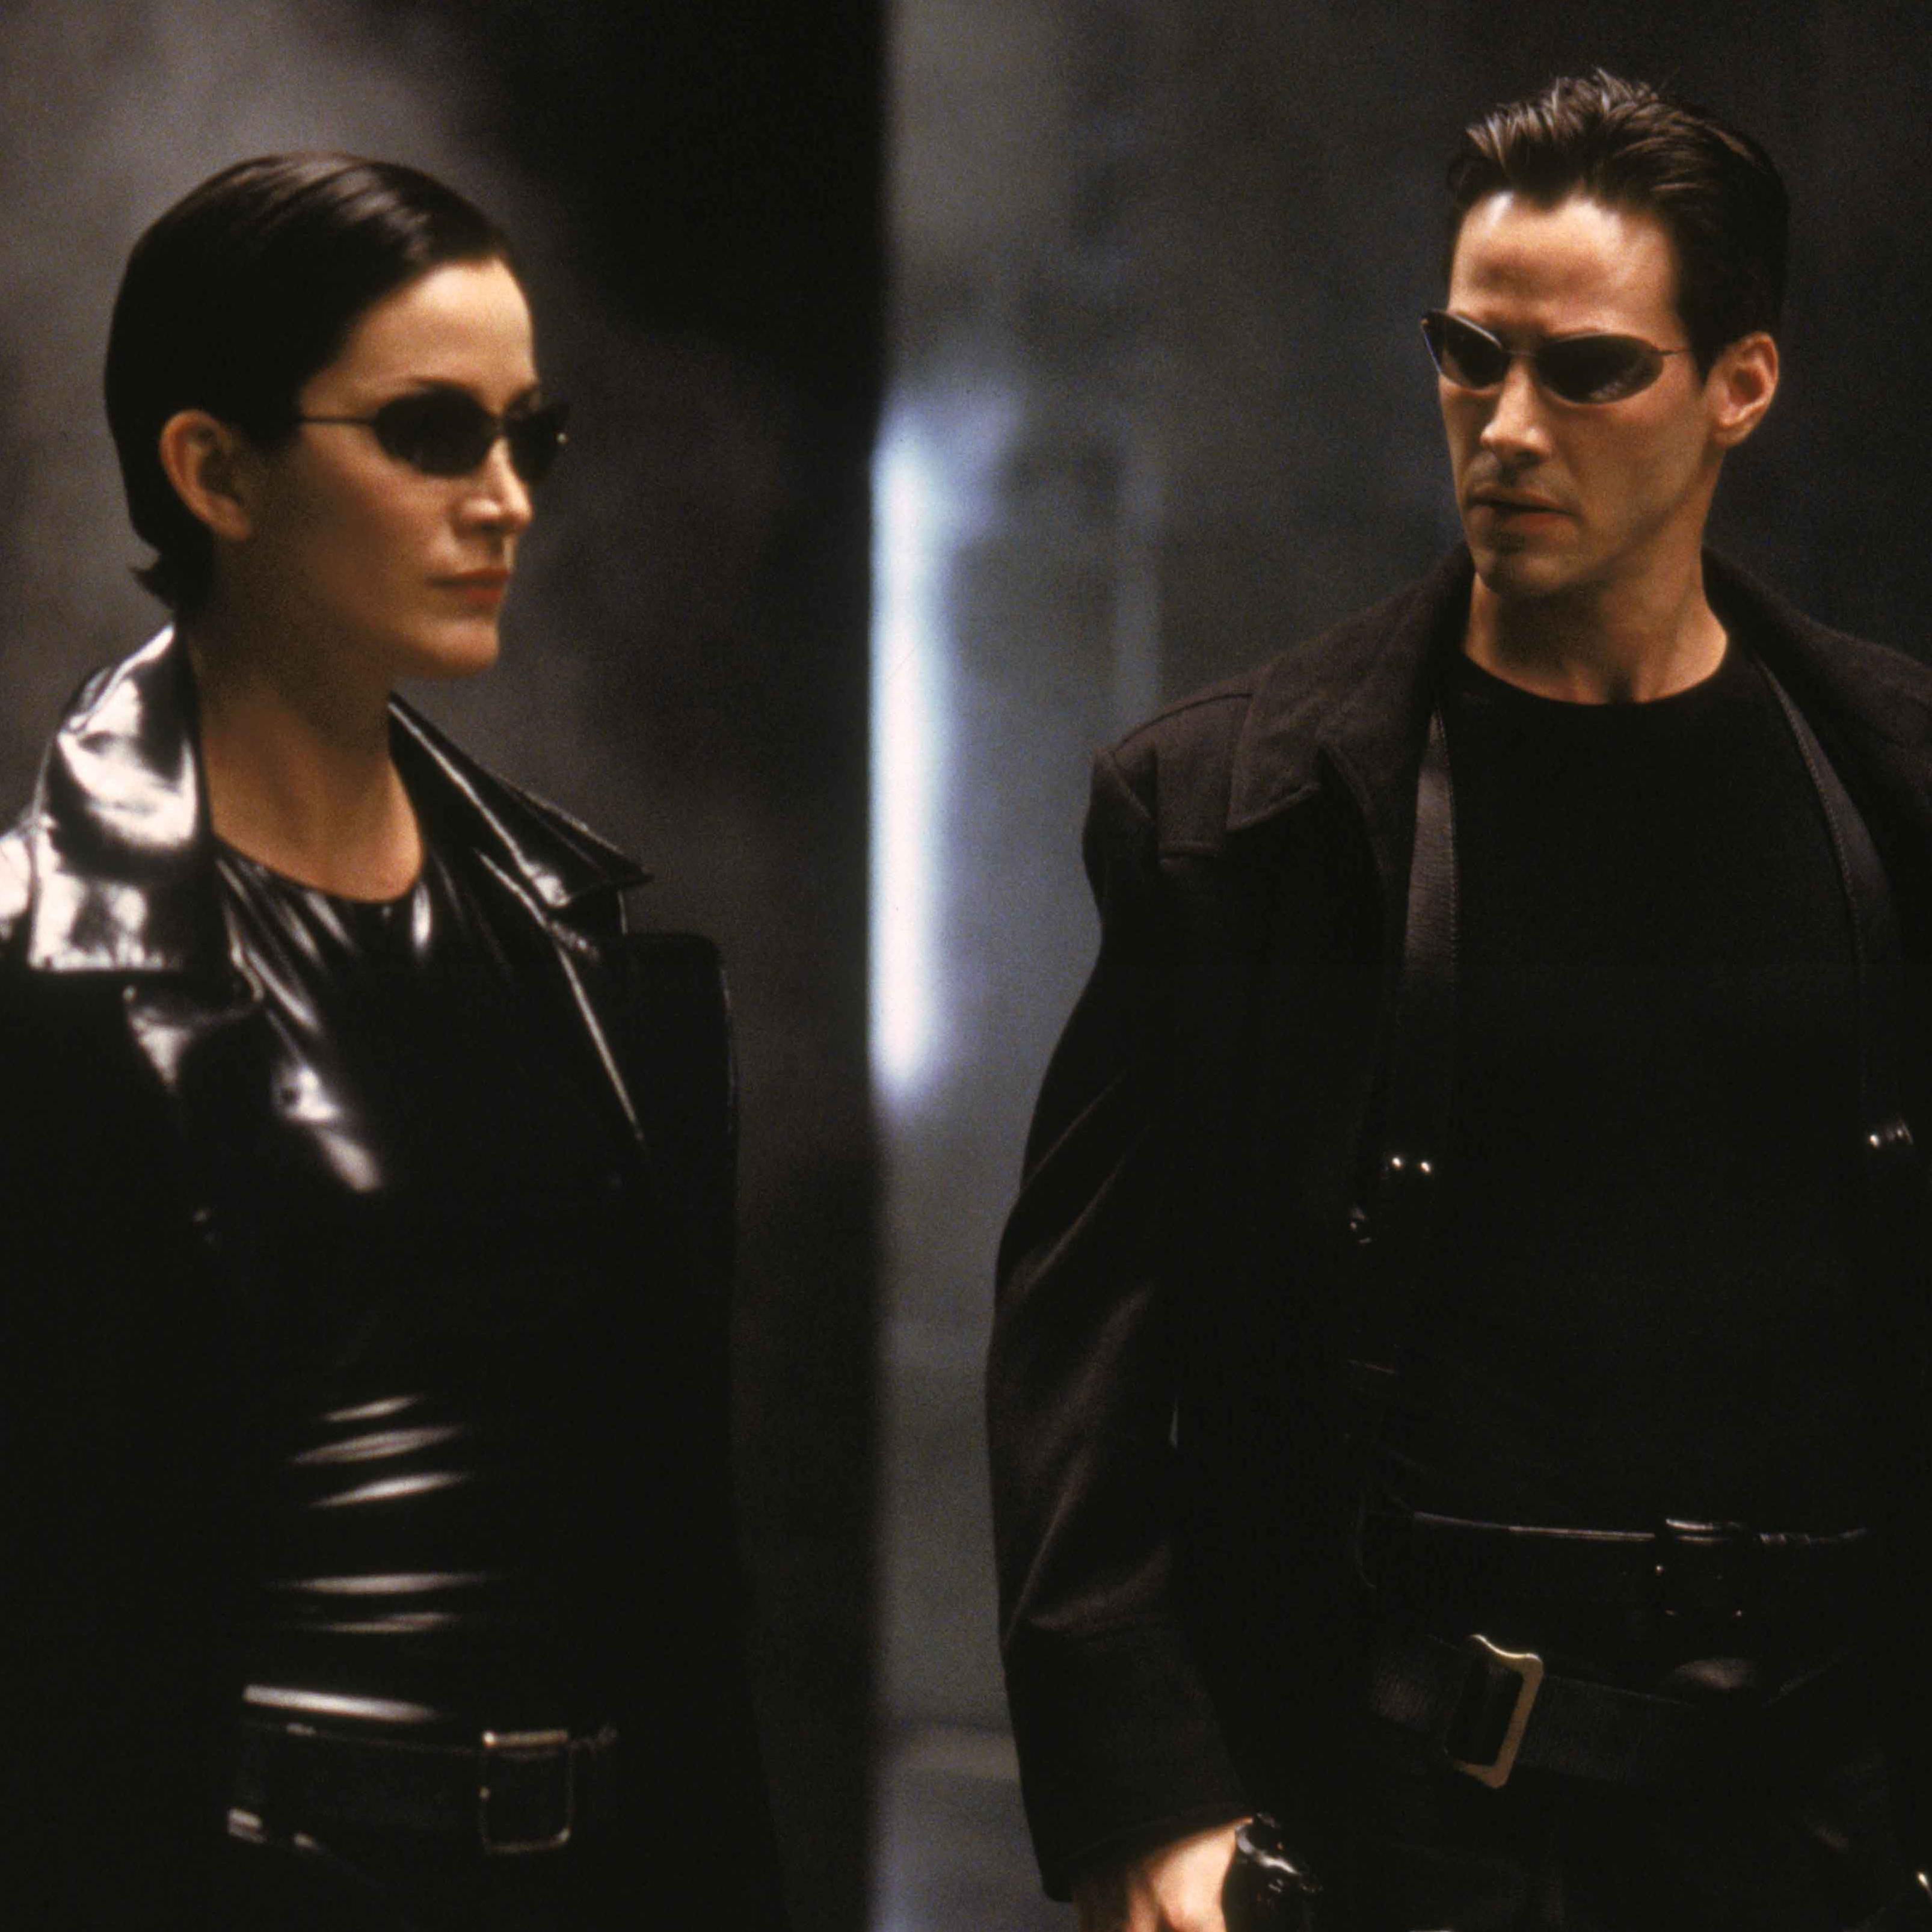 <p>再見尼歐!《駭客任務》上映 20 週年經典 4K 修復重返大銀幕</p>